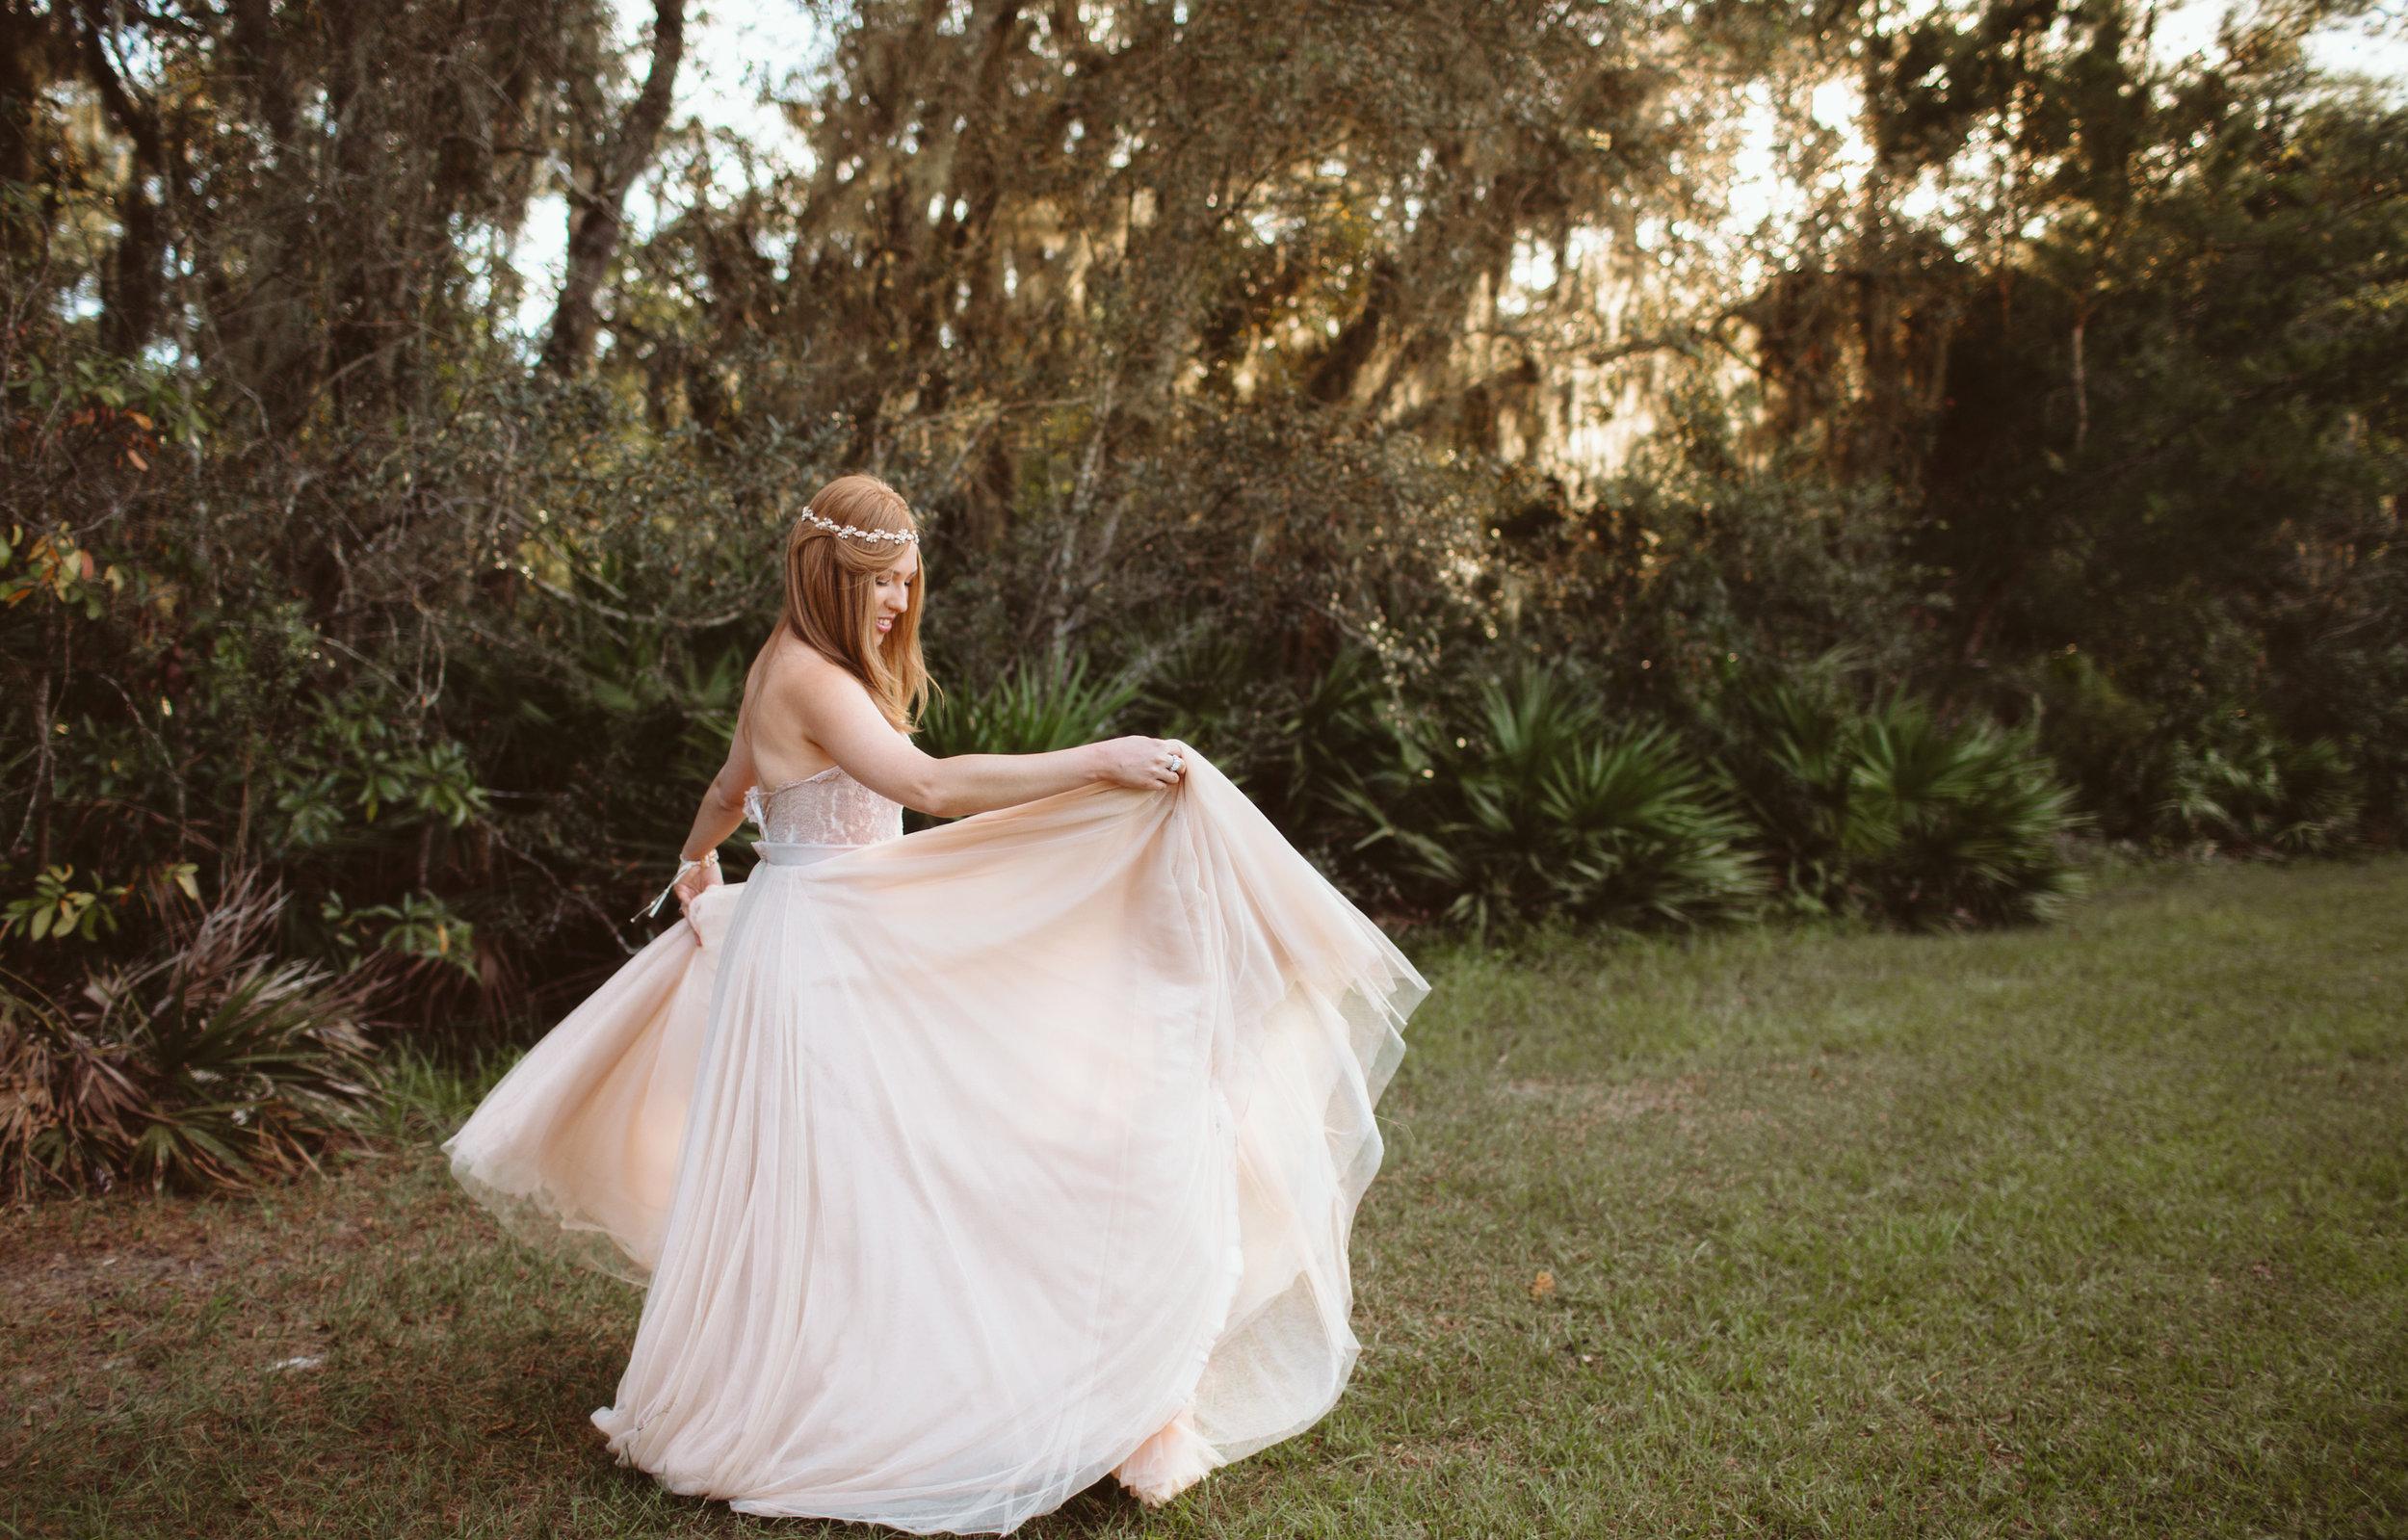 Breast Cancer awareness | Solutions bridal | Waterswoo | Vanessa Boy | vanessaboy.com |-384.com |final.jpg